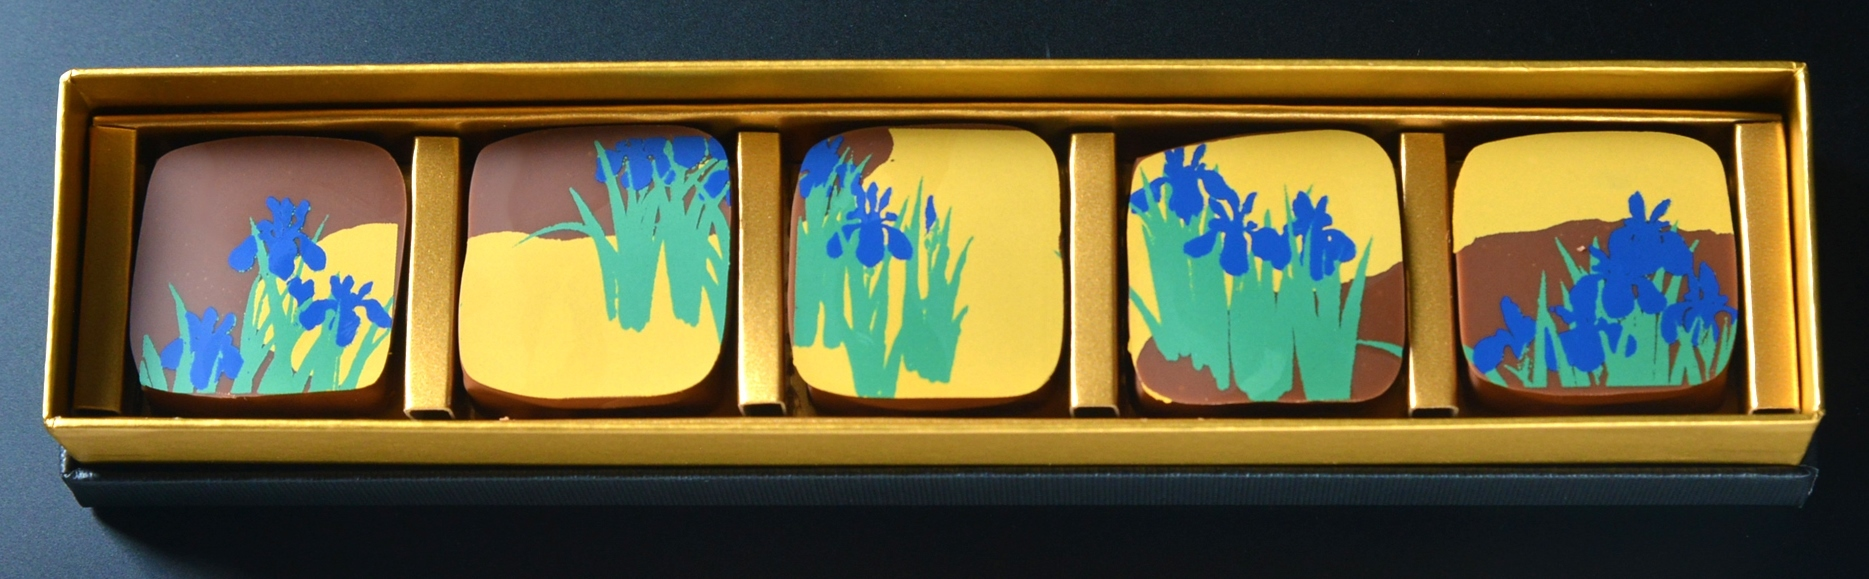 Okada Museum Chocolate 『雪佳・燕子花』2,800 円(税込)